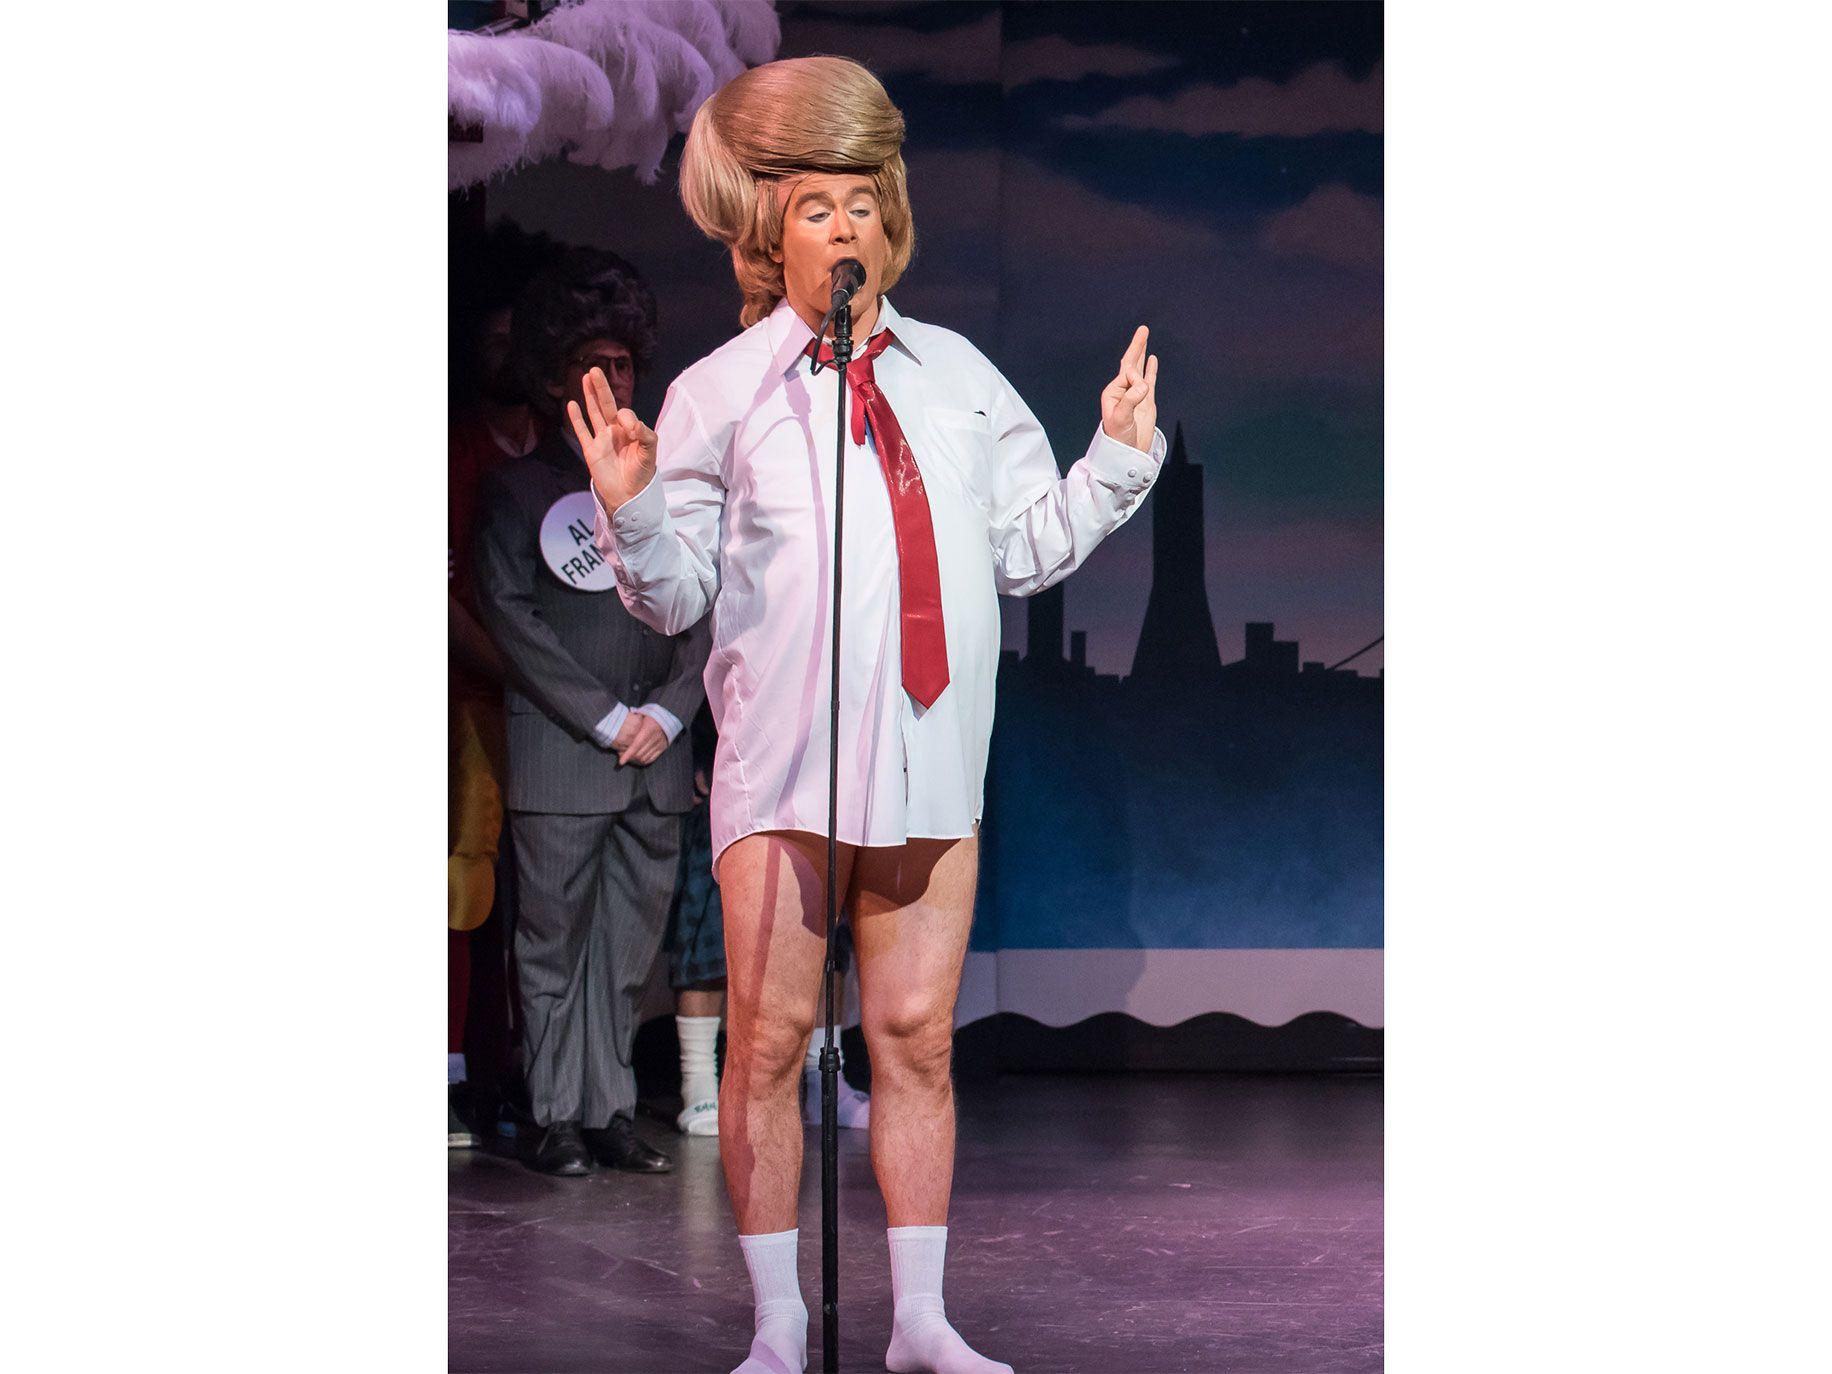 Derek Lux appears as President Donald Trump.